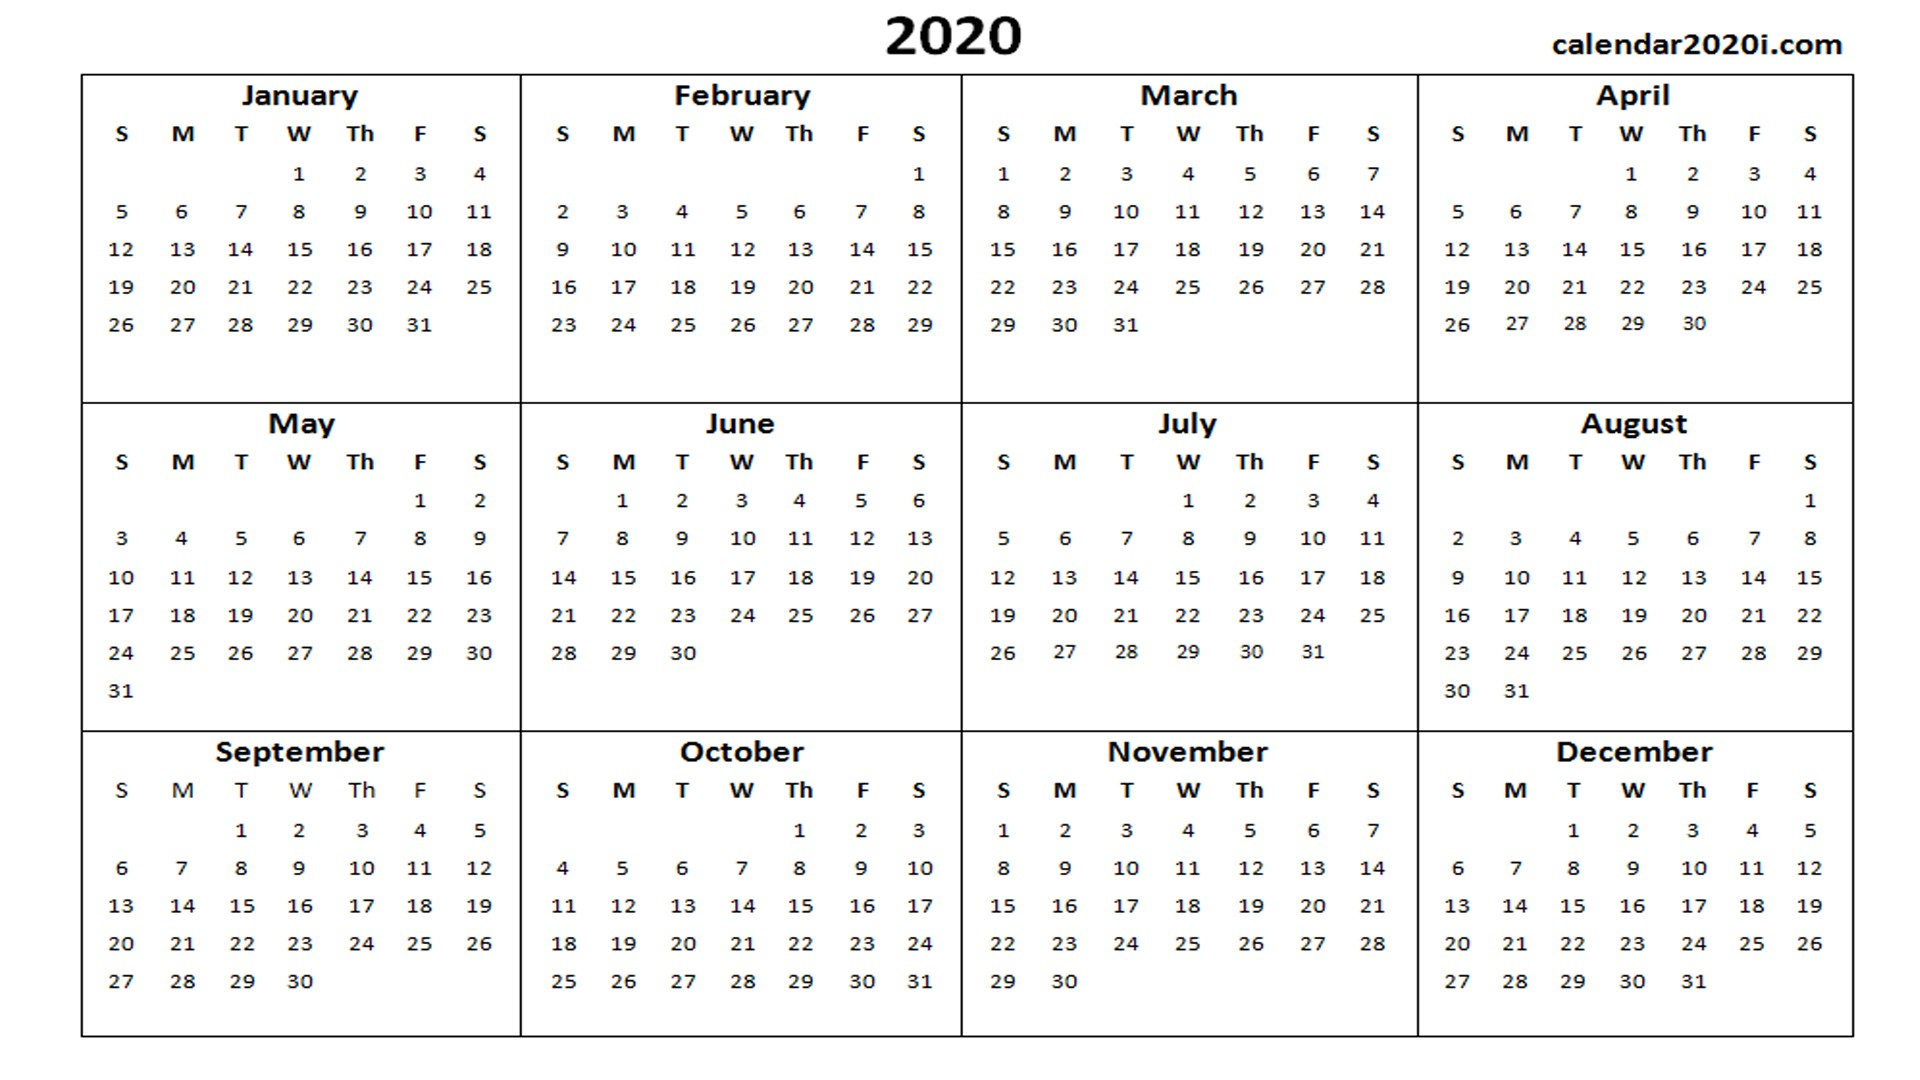 Printable Free Calendars 2020 2020 Calendar Printable Template Holidays Word Excel